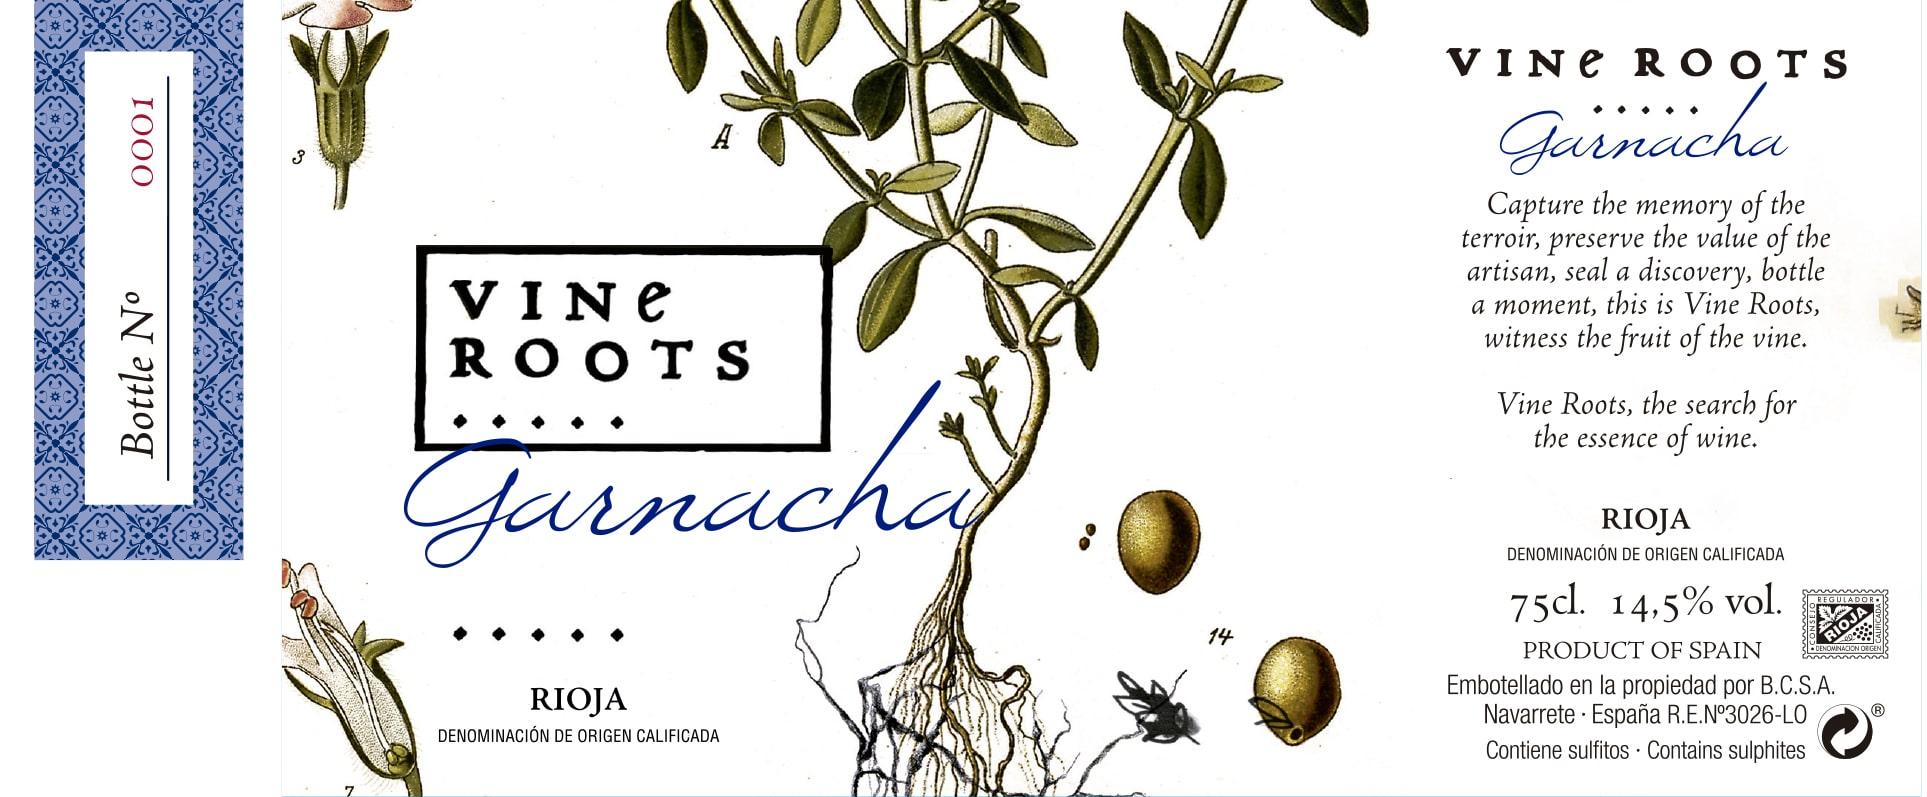 Vine Roots Garnacha Tinta Ecológico